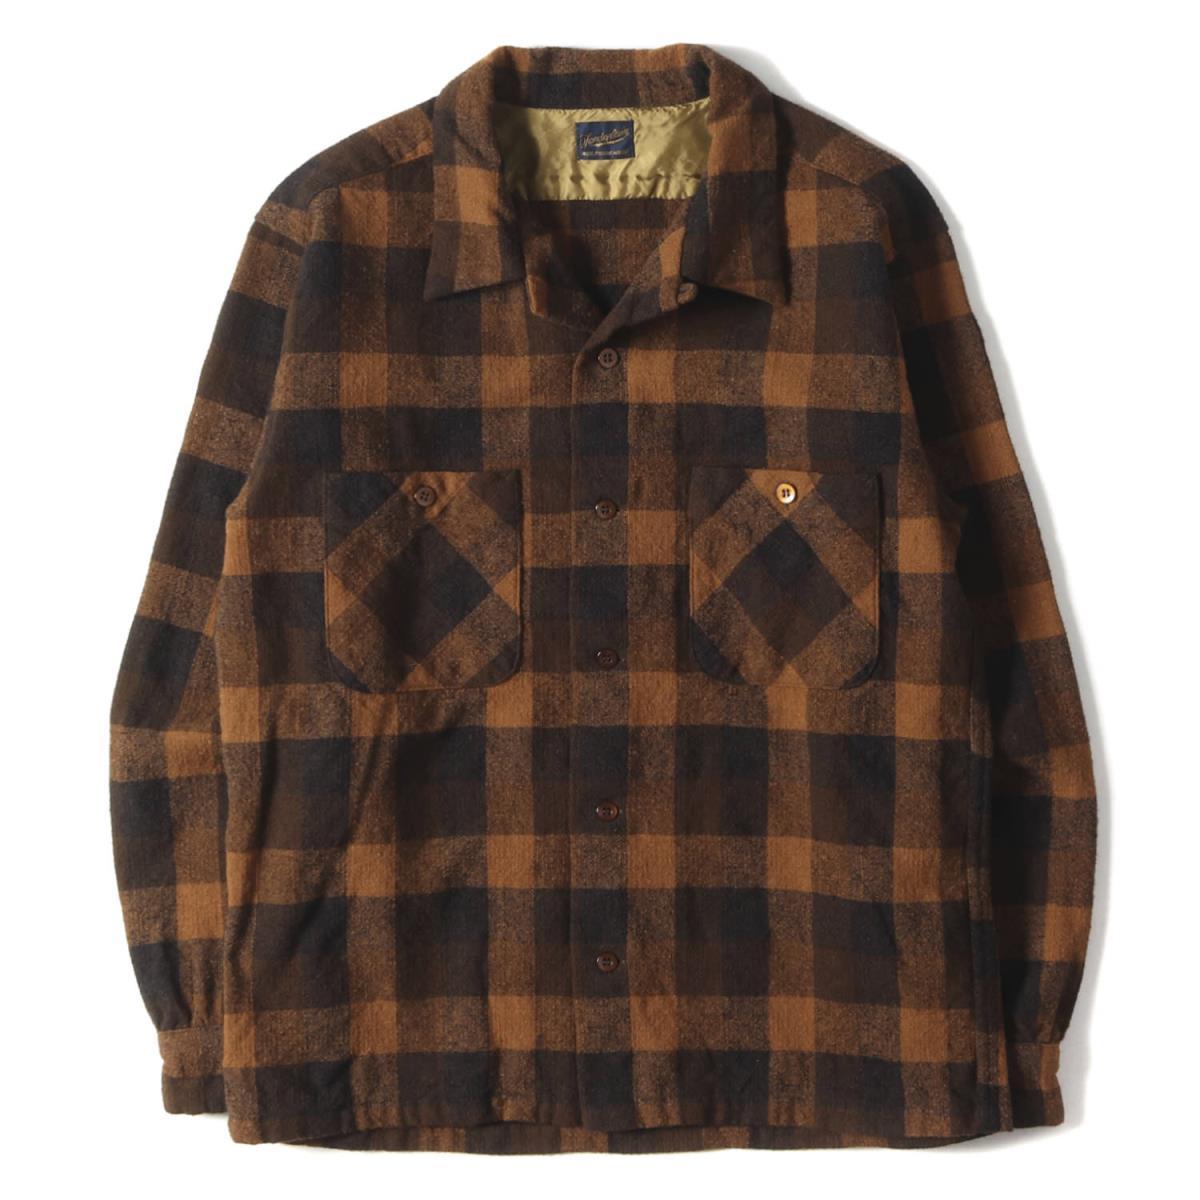 TENDERLOIN テンダーロイン シャツ オープンカラー チェック ウールシャツ T-WOOL SHT P オレンジ M 【メンズ】【中古】【美品】【K2592】